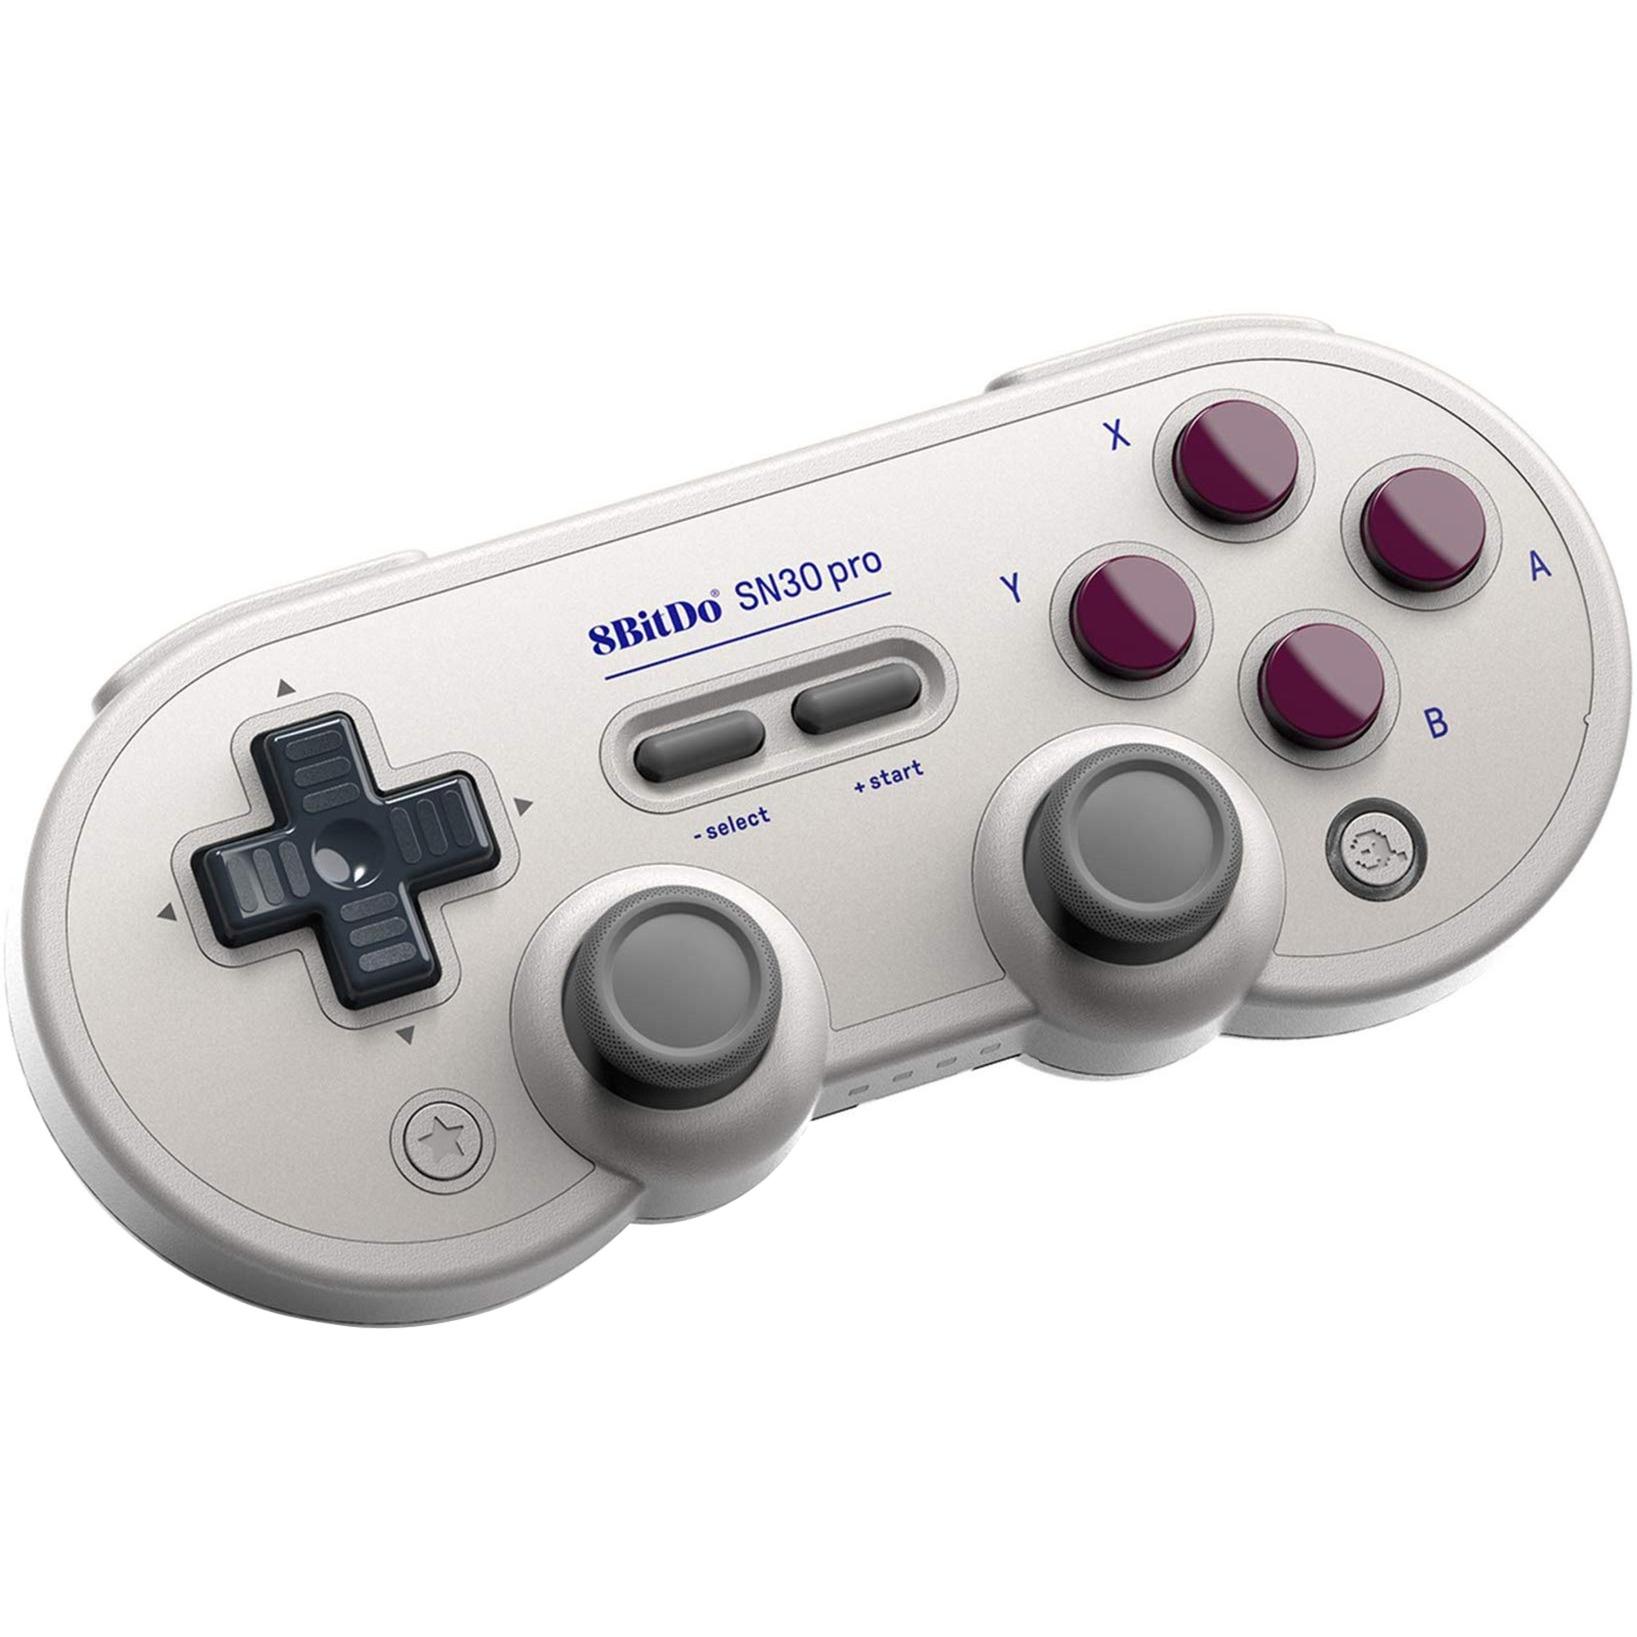 SN30 Pro G Classic, Gamepad